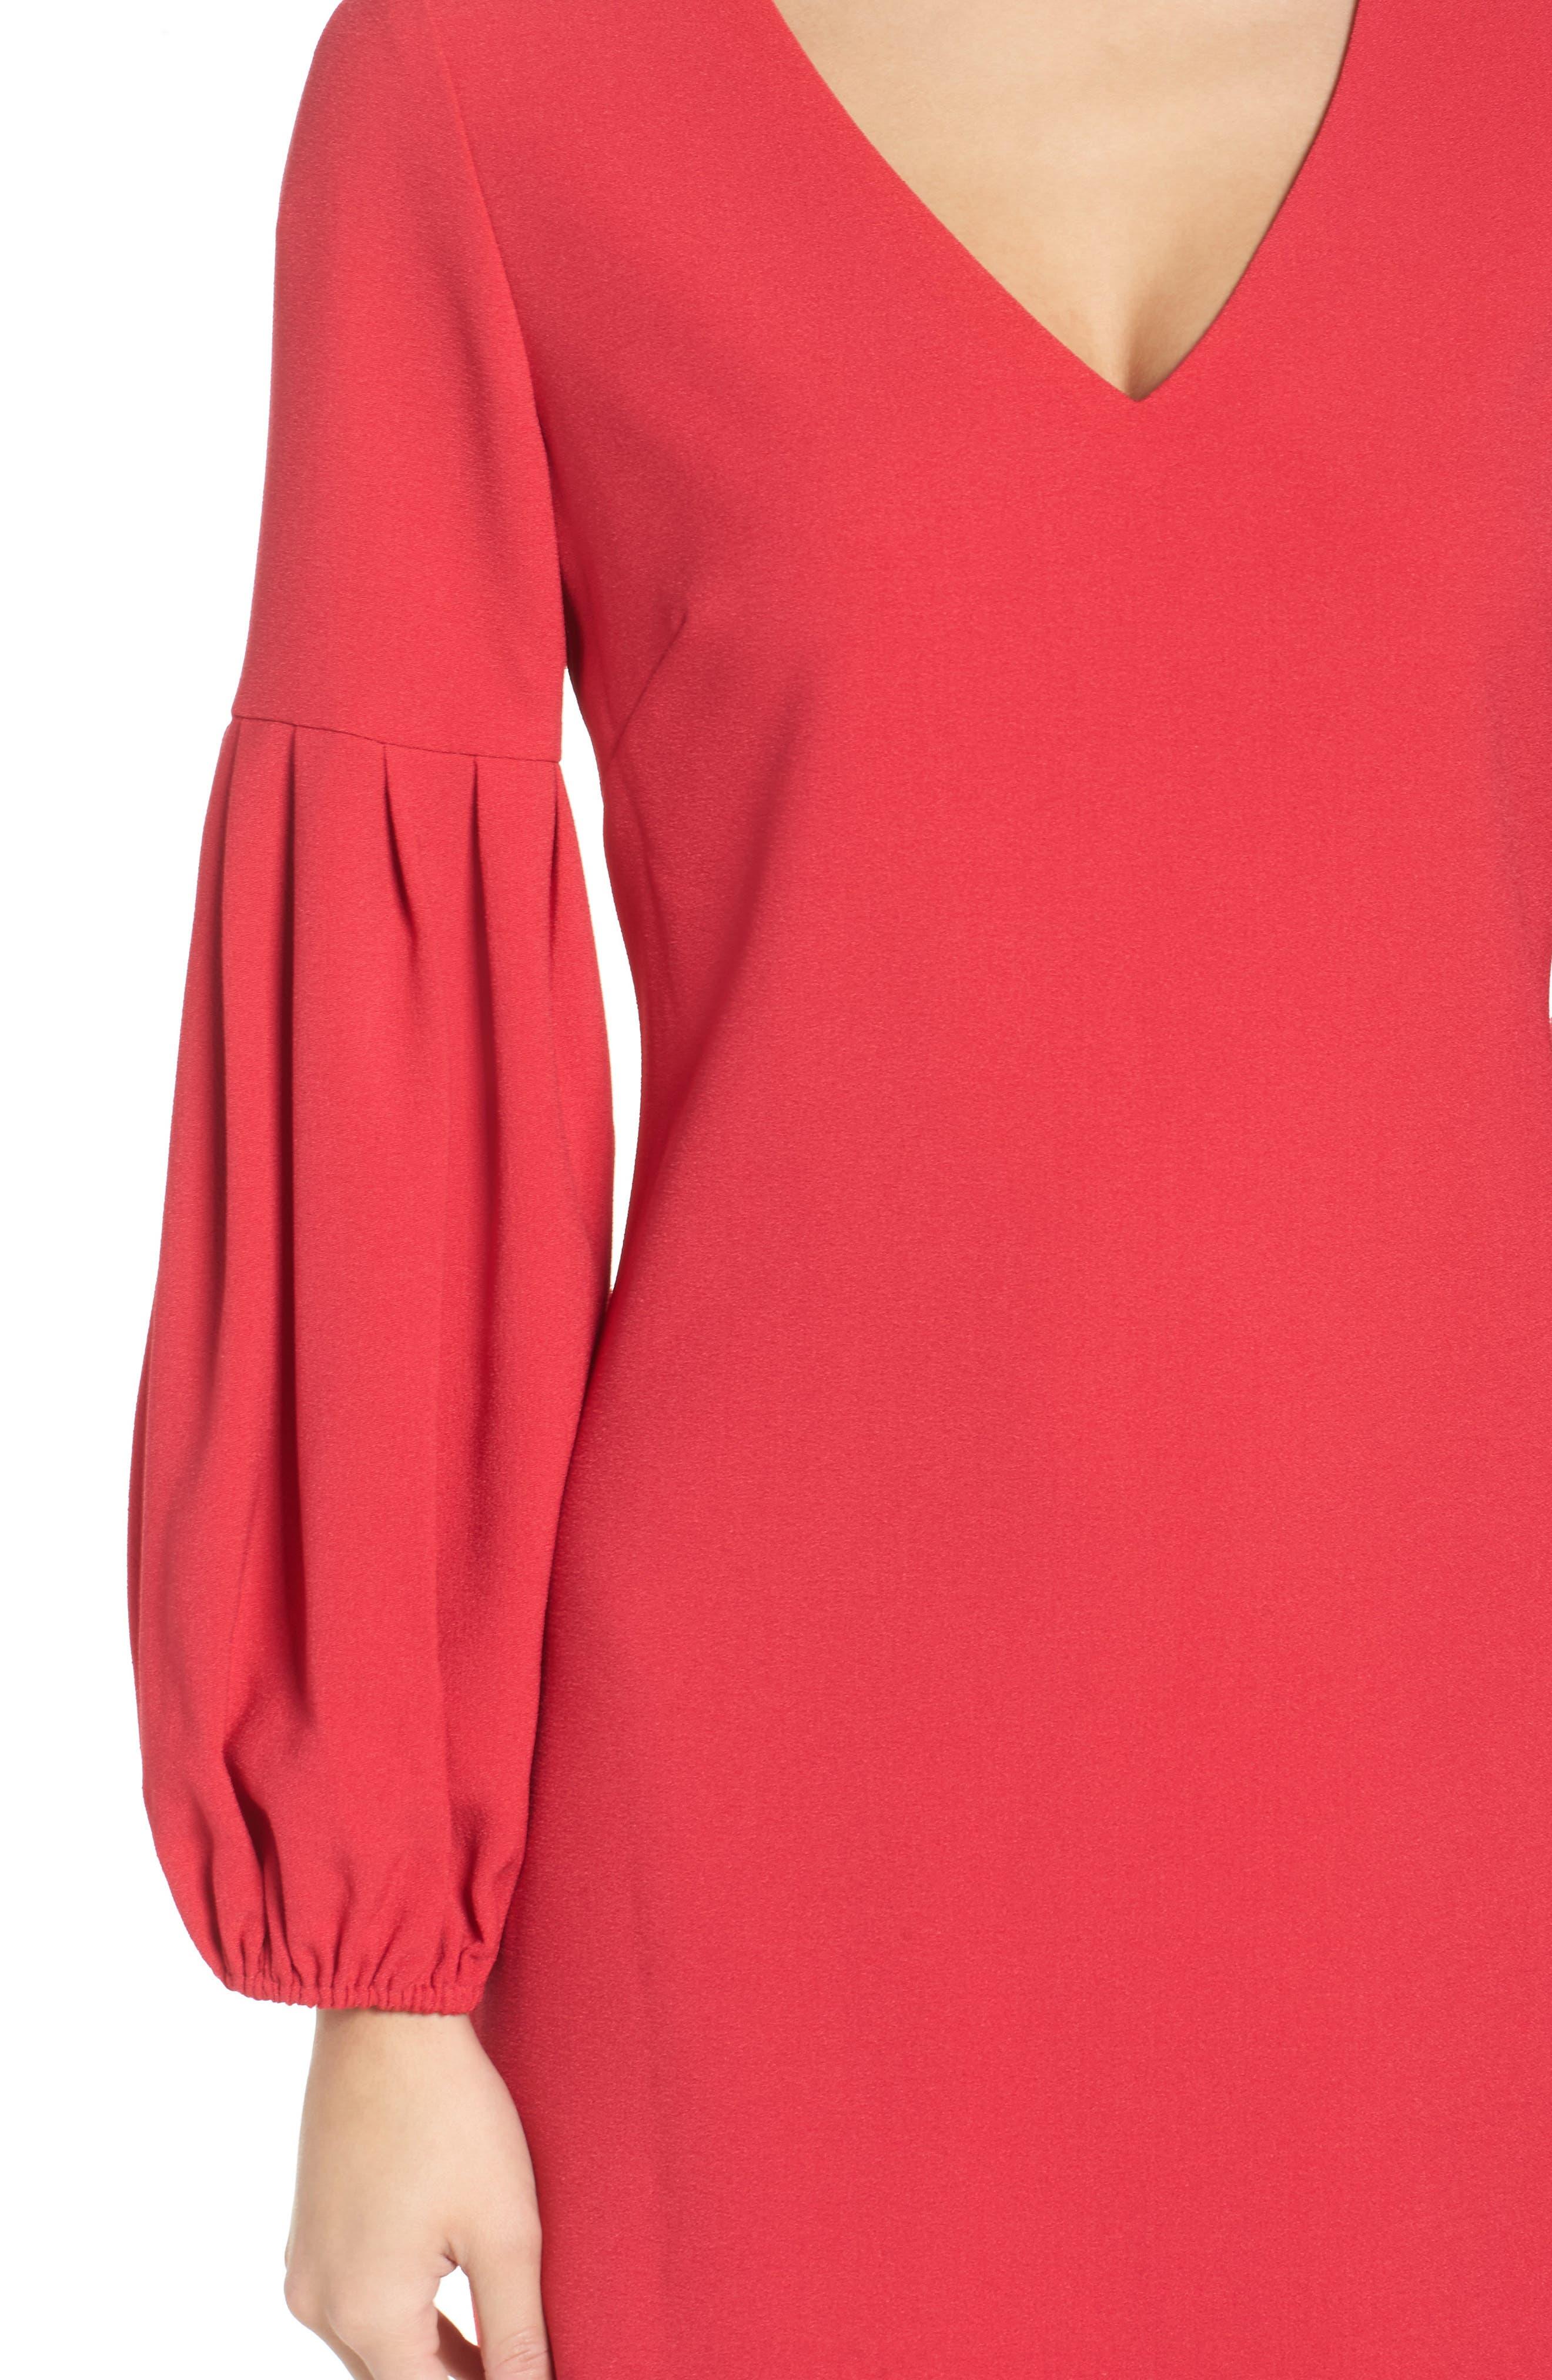 Bloused Sleeve Shift Dress,                             Alternate thumbnail 4, color,                             610